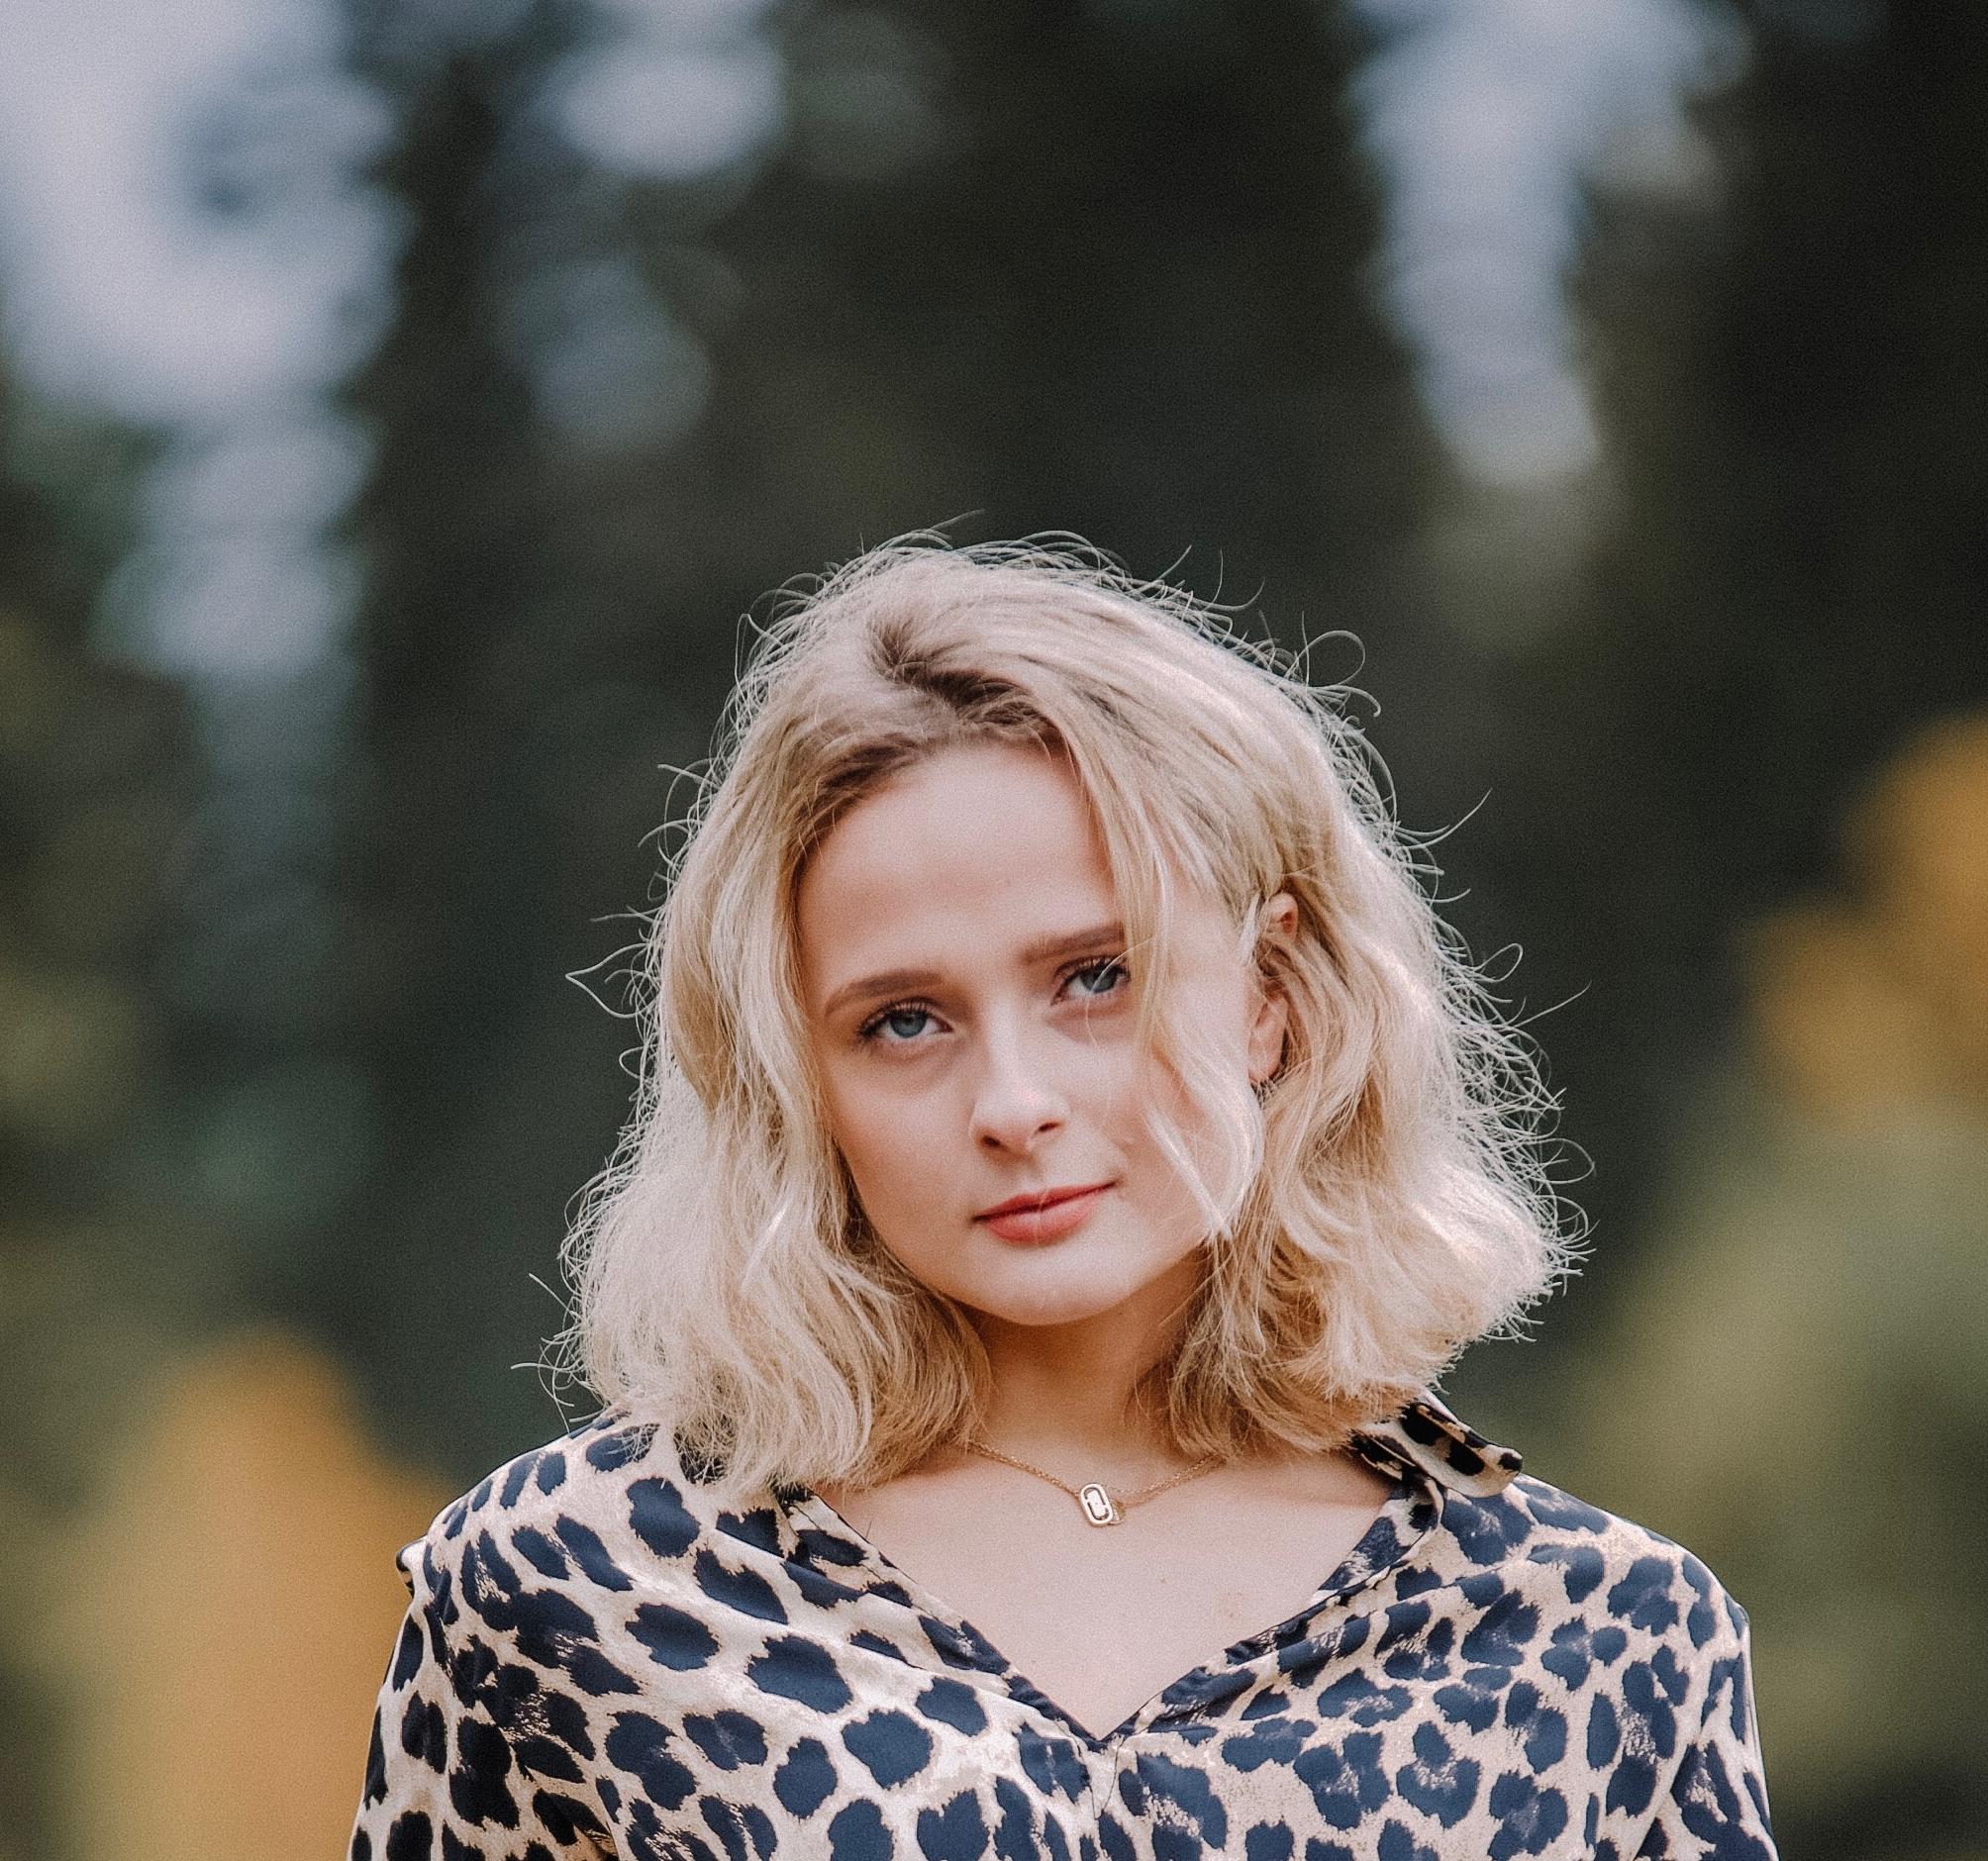 Musikkteaterhøyskolen - Hedda Skjelstad Hippe